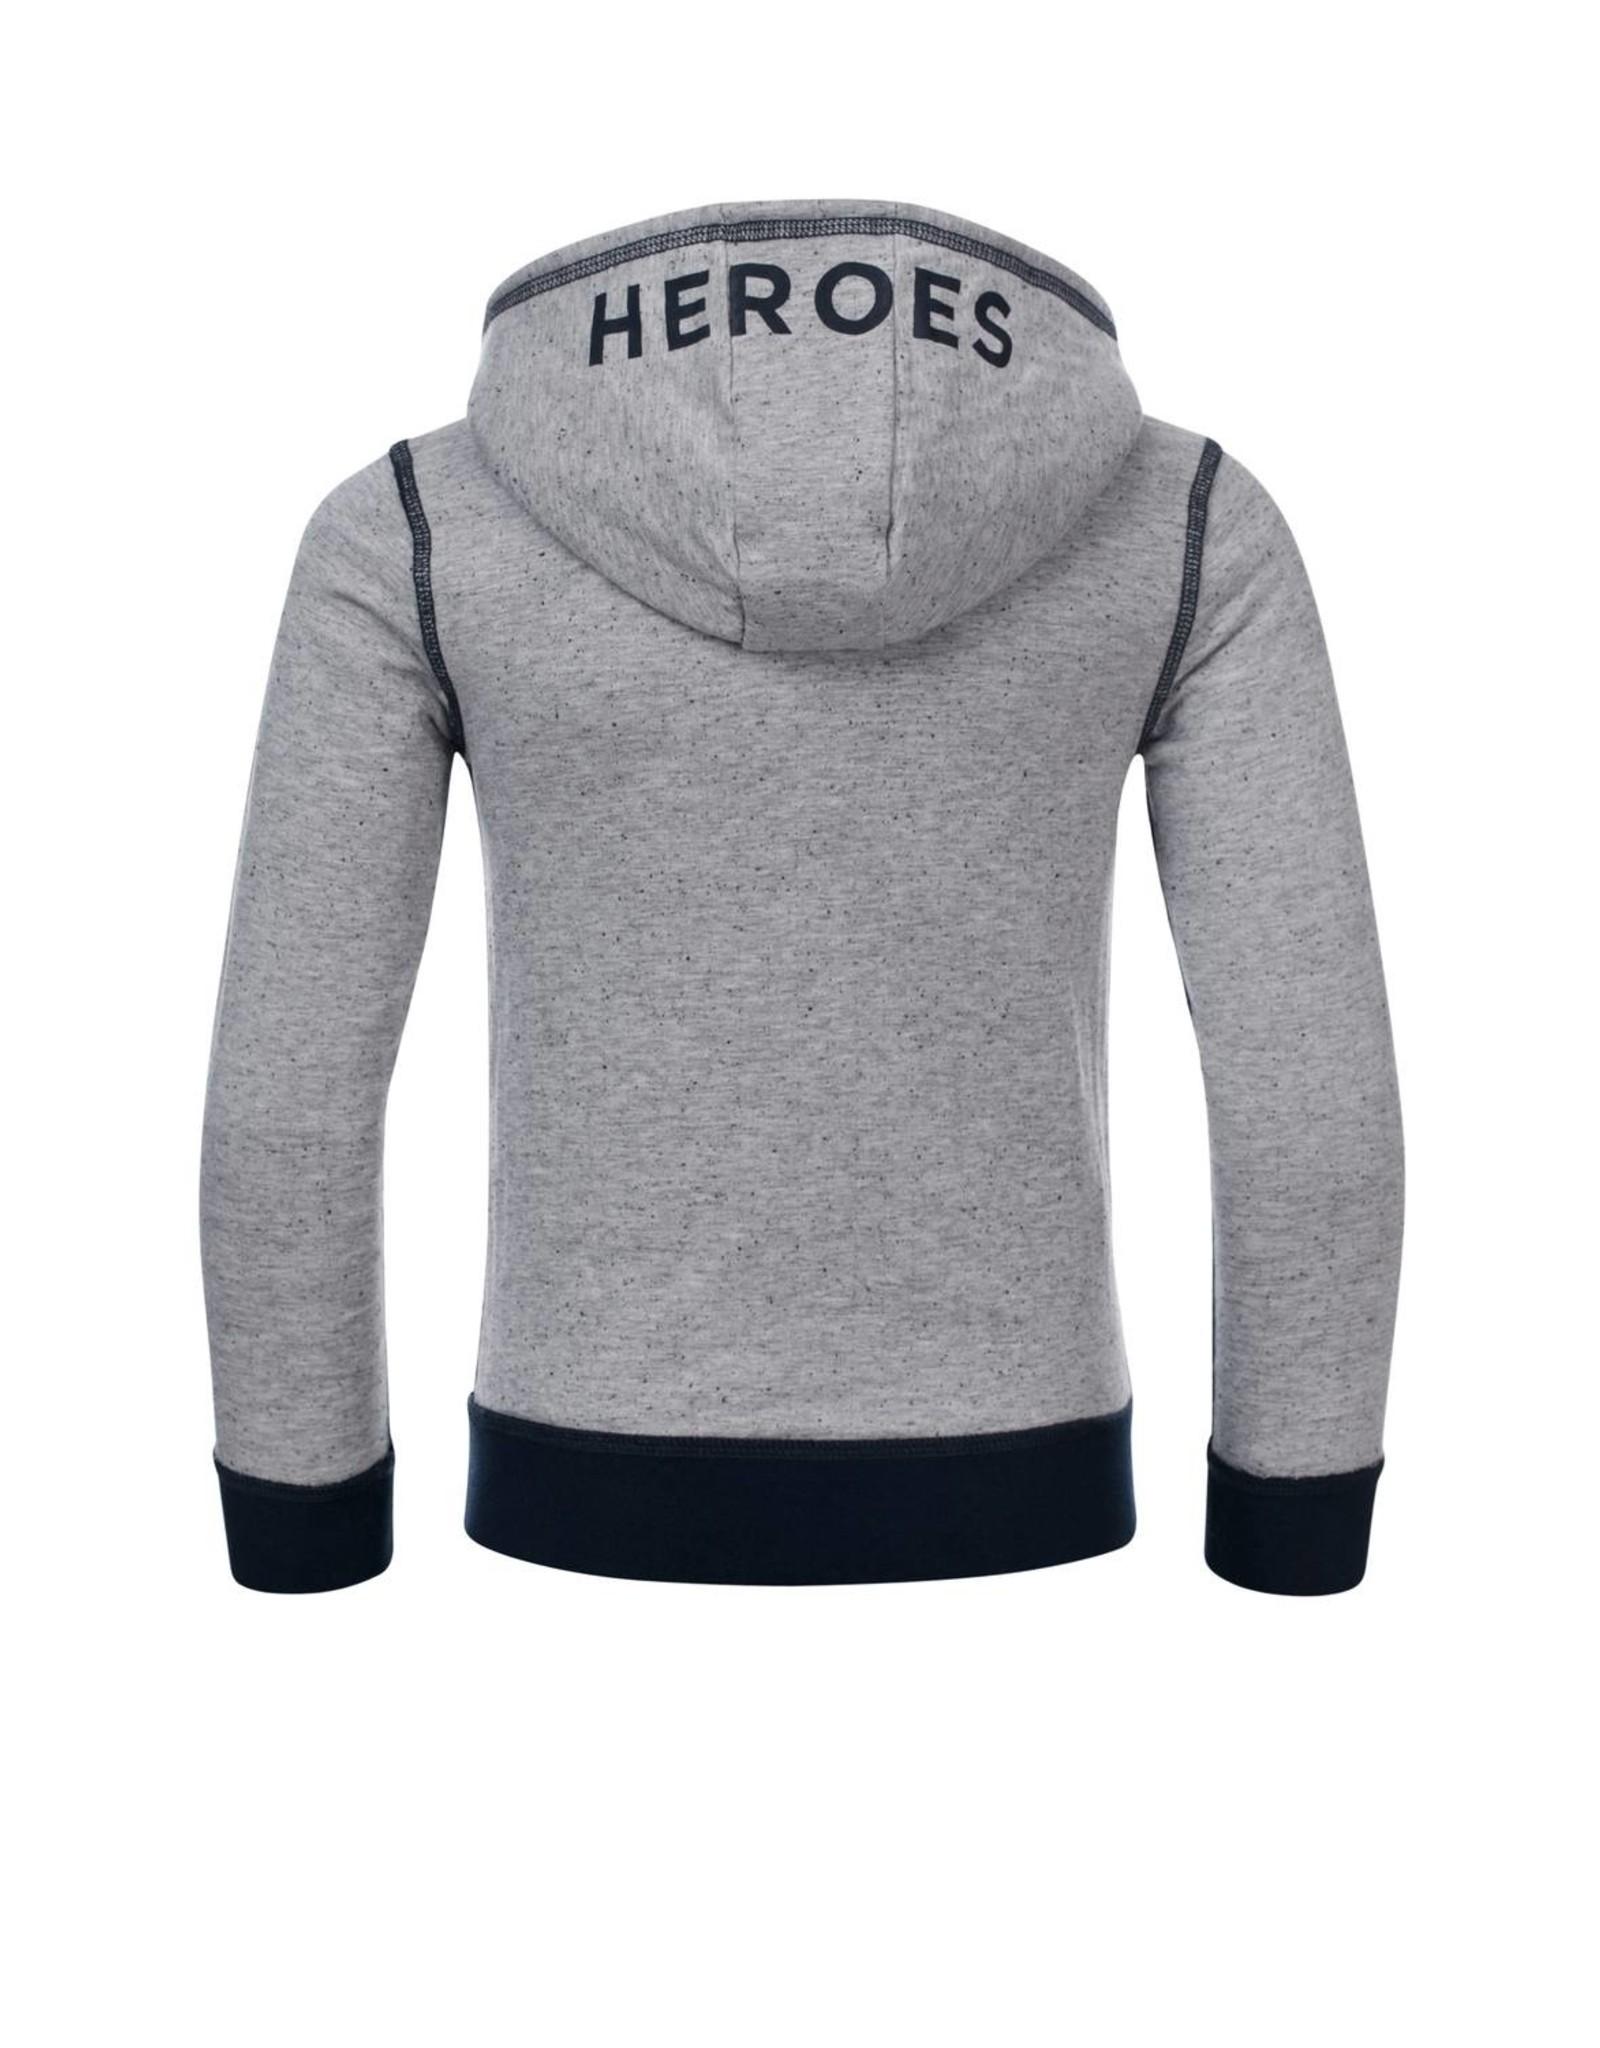 Common Heroes FLIP reversable bonded hooded sweat